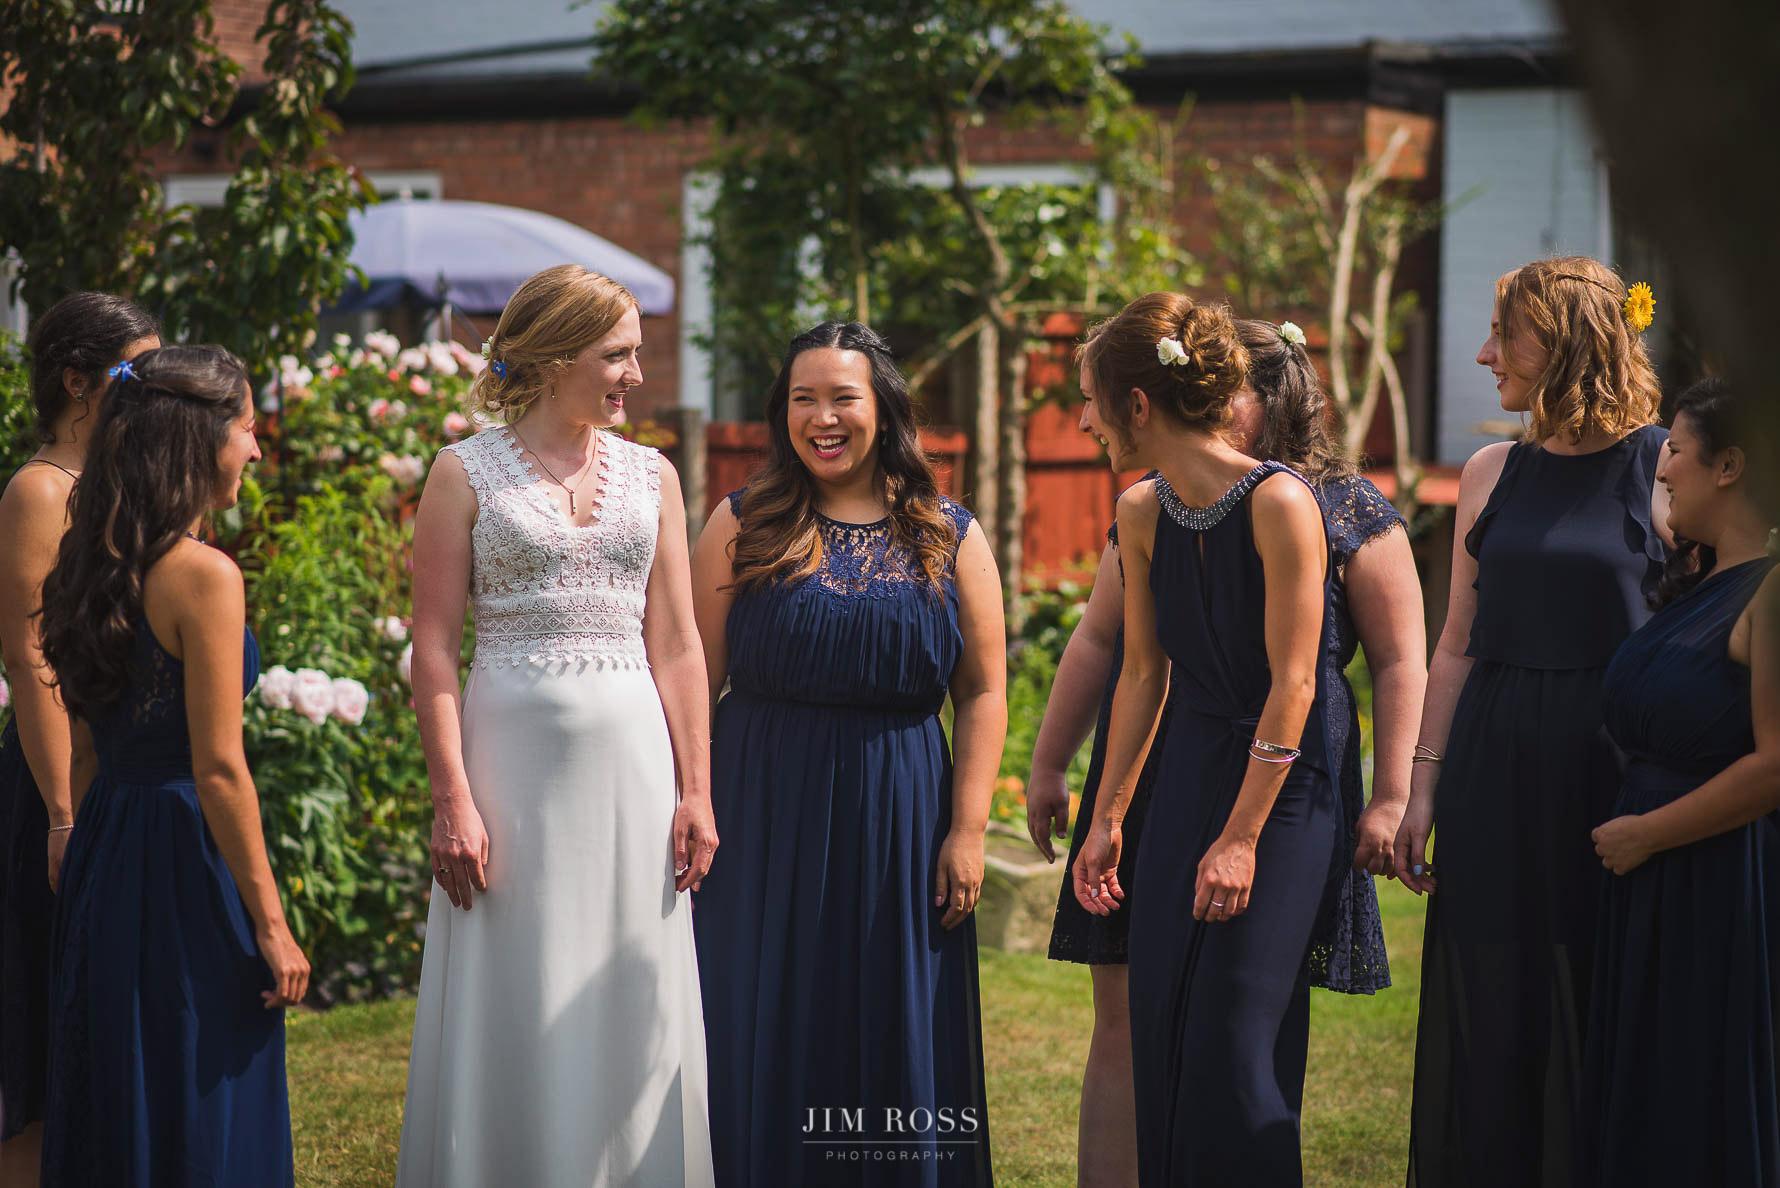 Admiring elegant bridal dress